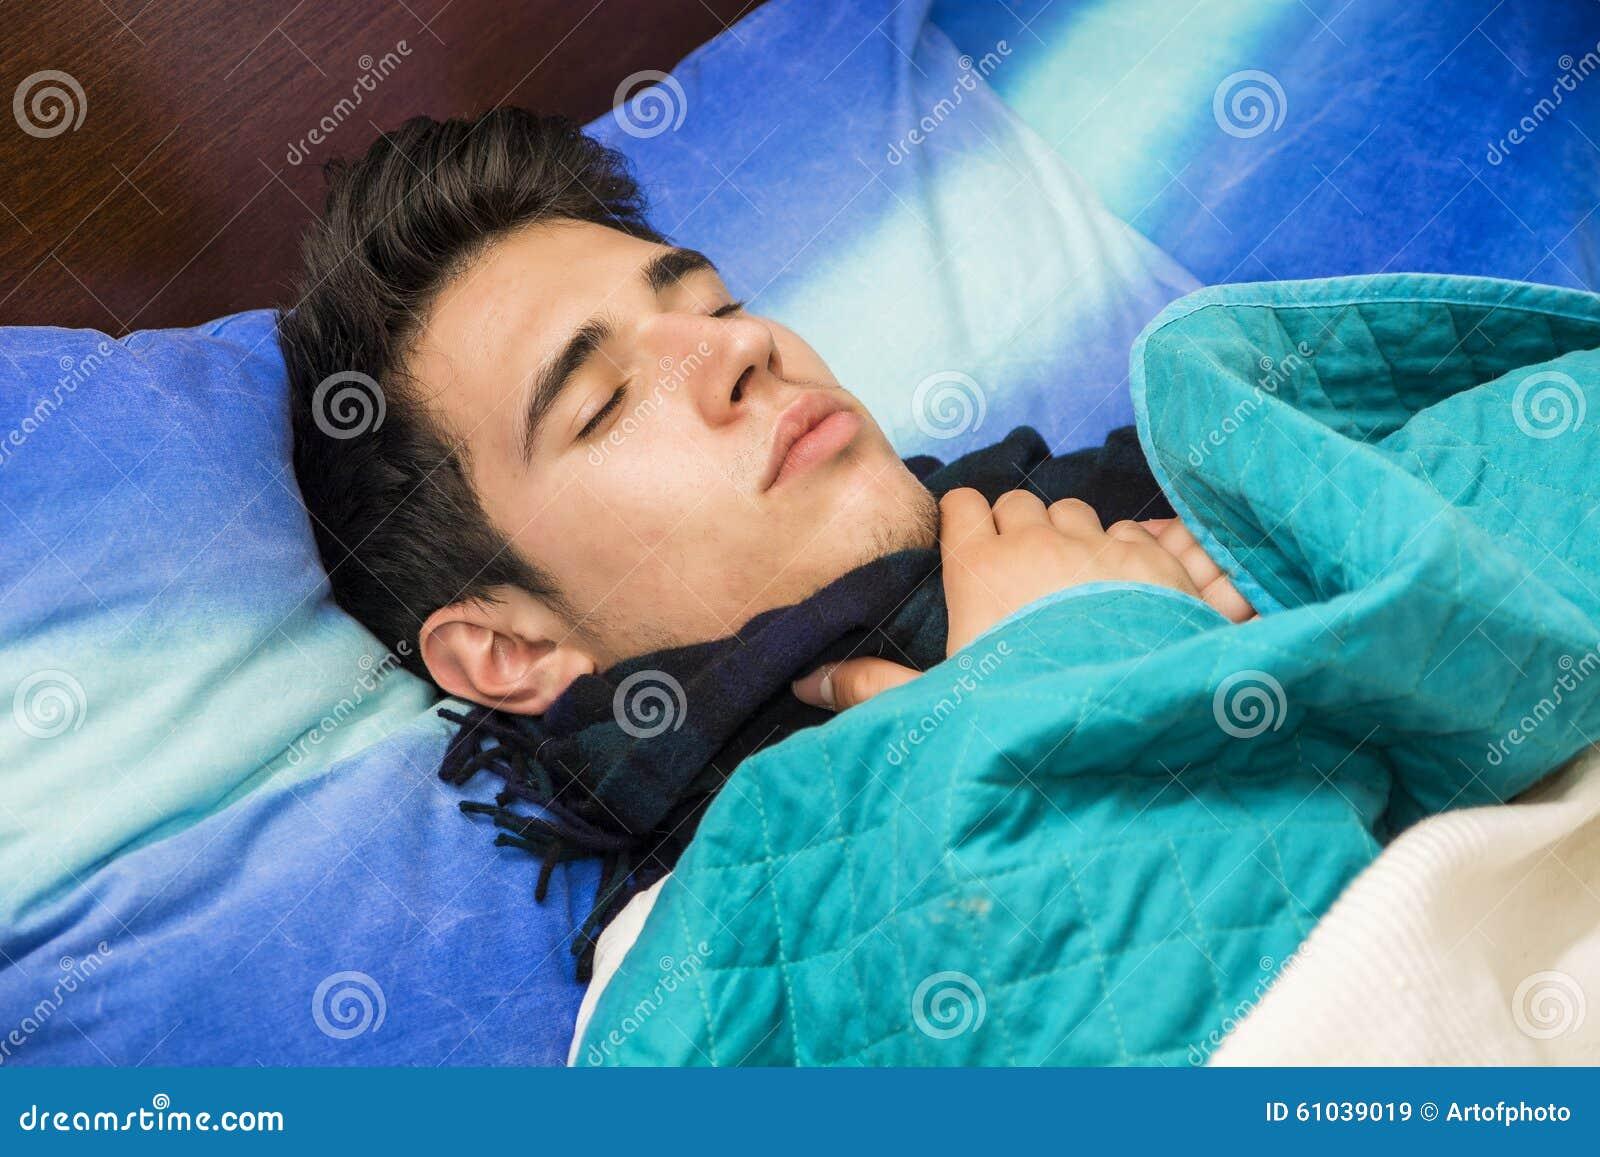 jeune homme malade ou souffrant dans le lit image stock image 61039019. Black Bedroom Furniture Sets. Home Design Ideas